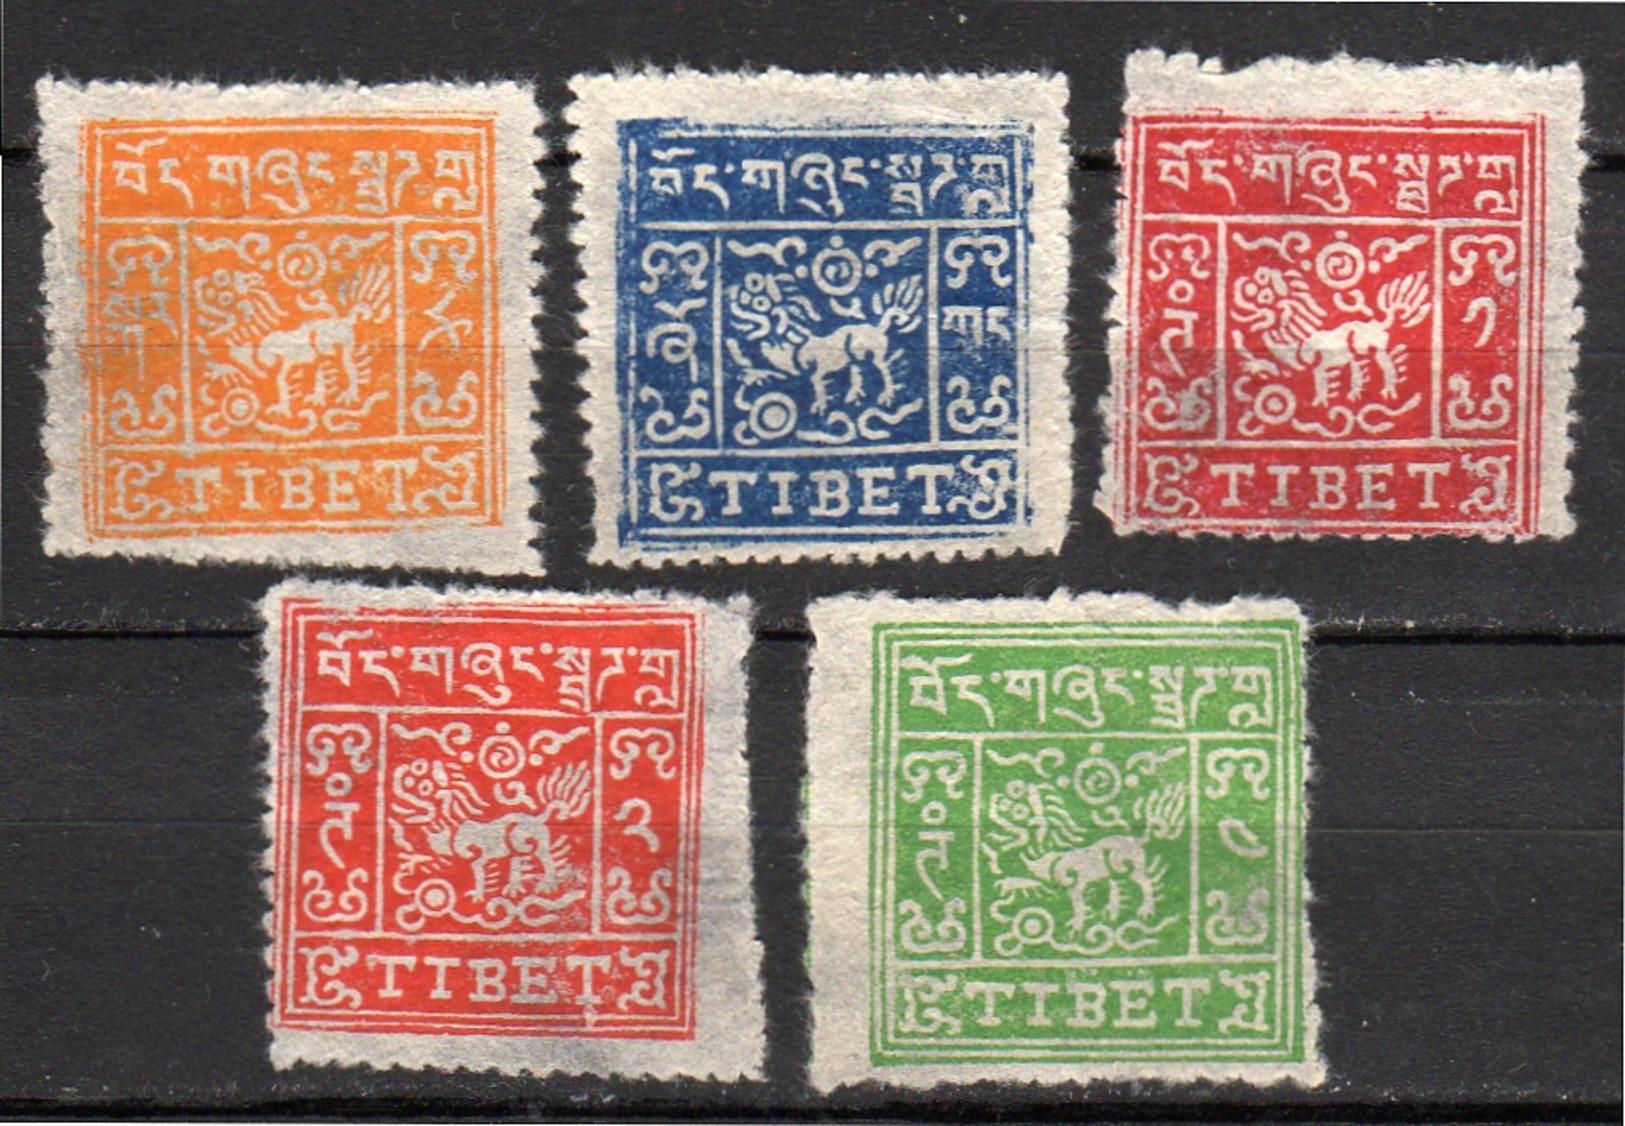 Tibet Complete Set Original Perf., Clichés Are: 5,4,2,1,3 Carmine 1 Tr Has Red Vertical Line/fiber XF!! (t36) - Postzegels